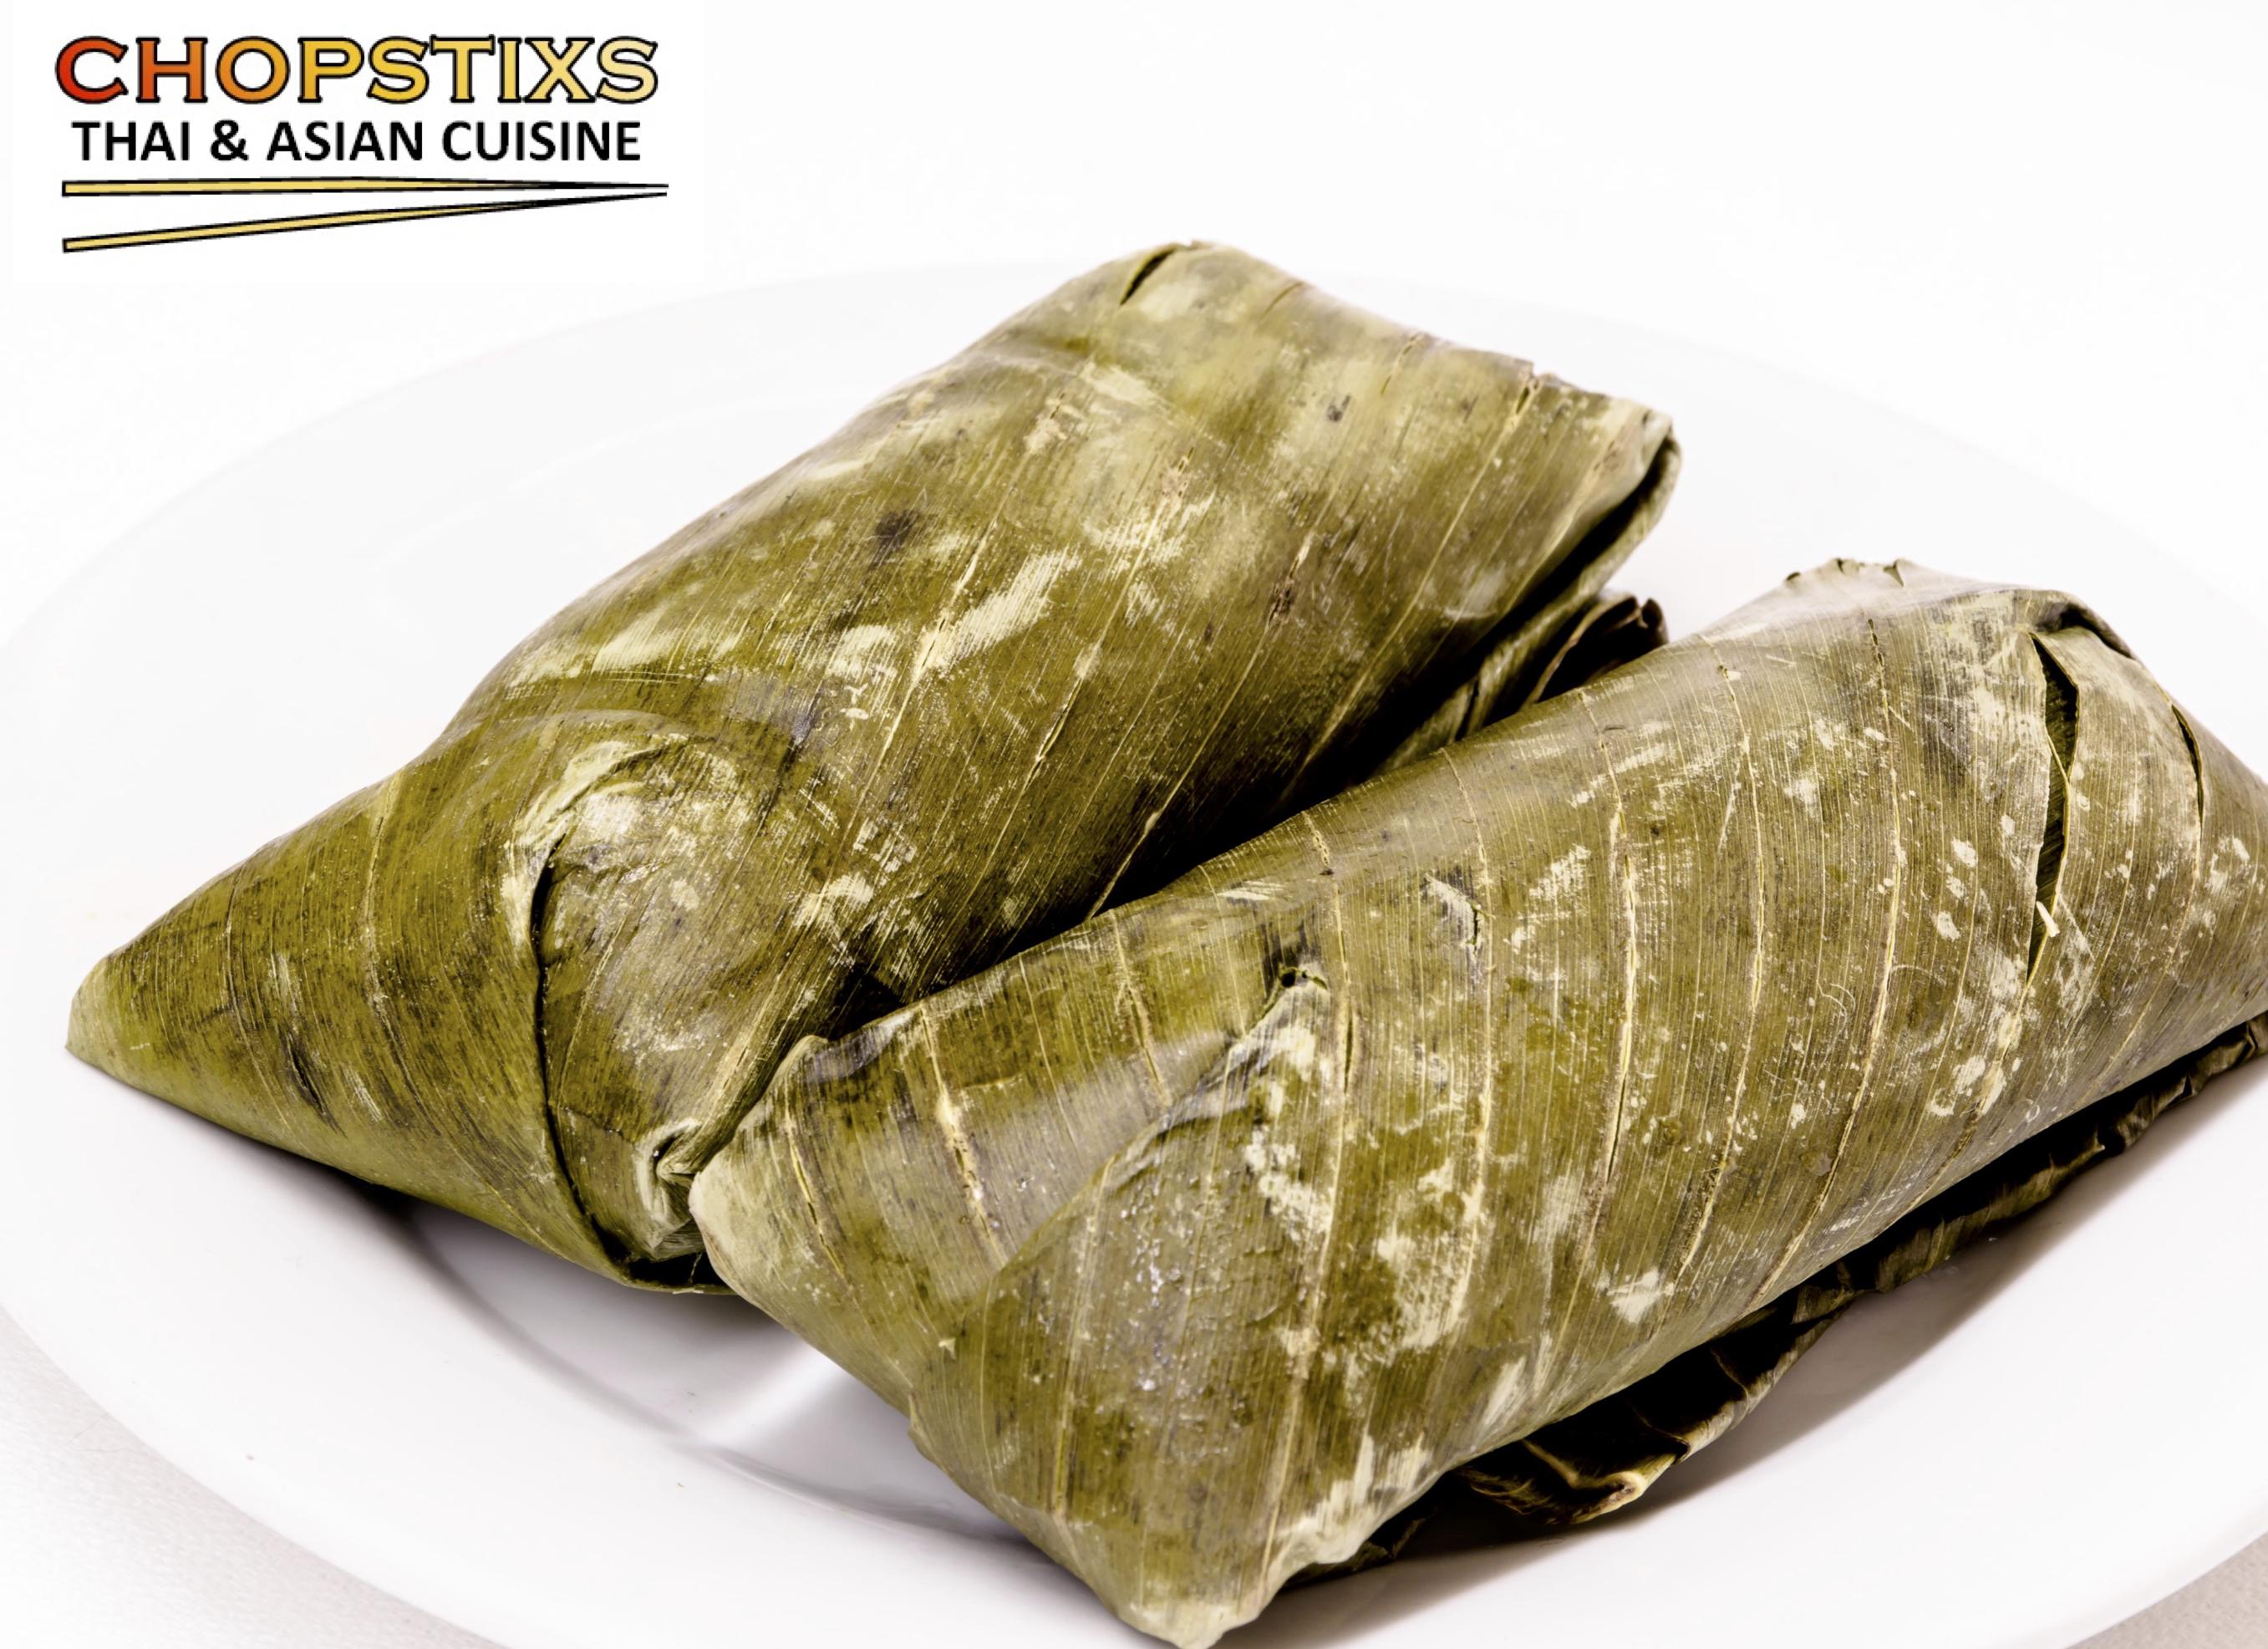 Banana Dumpling (Khao Tom Mud) Image